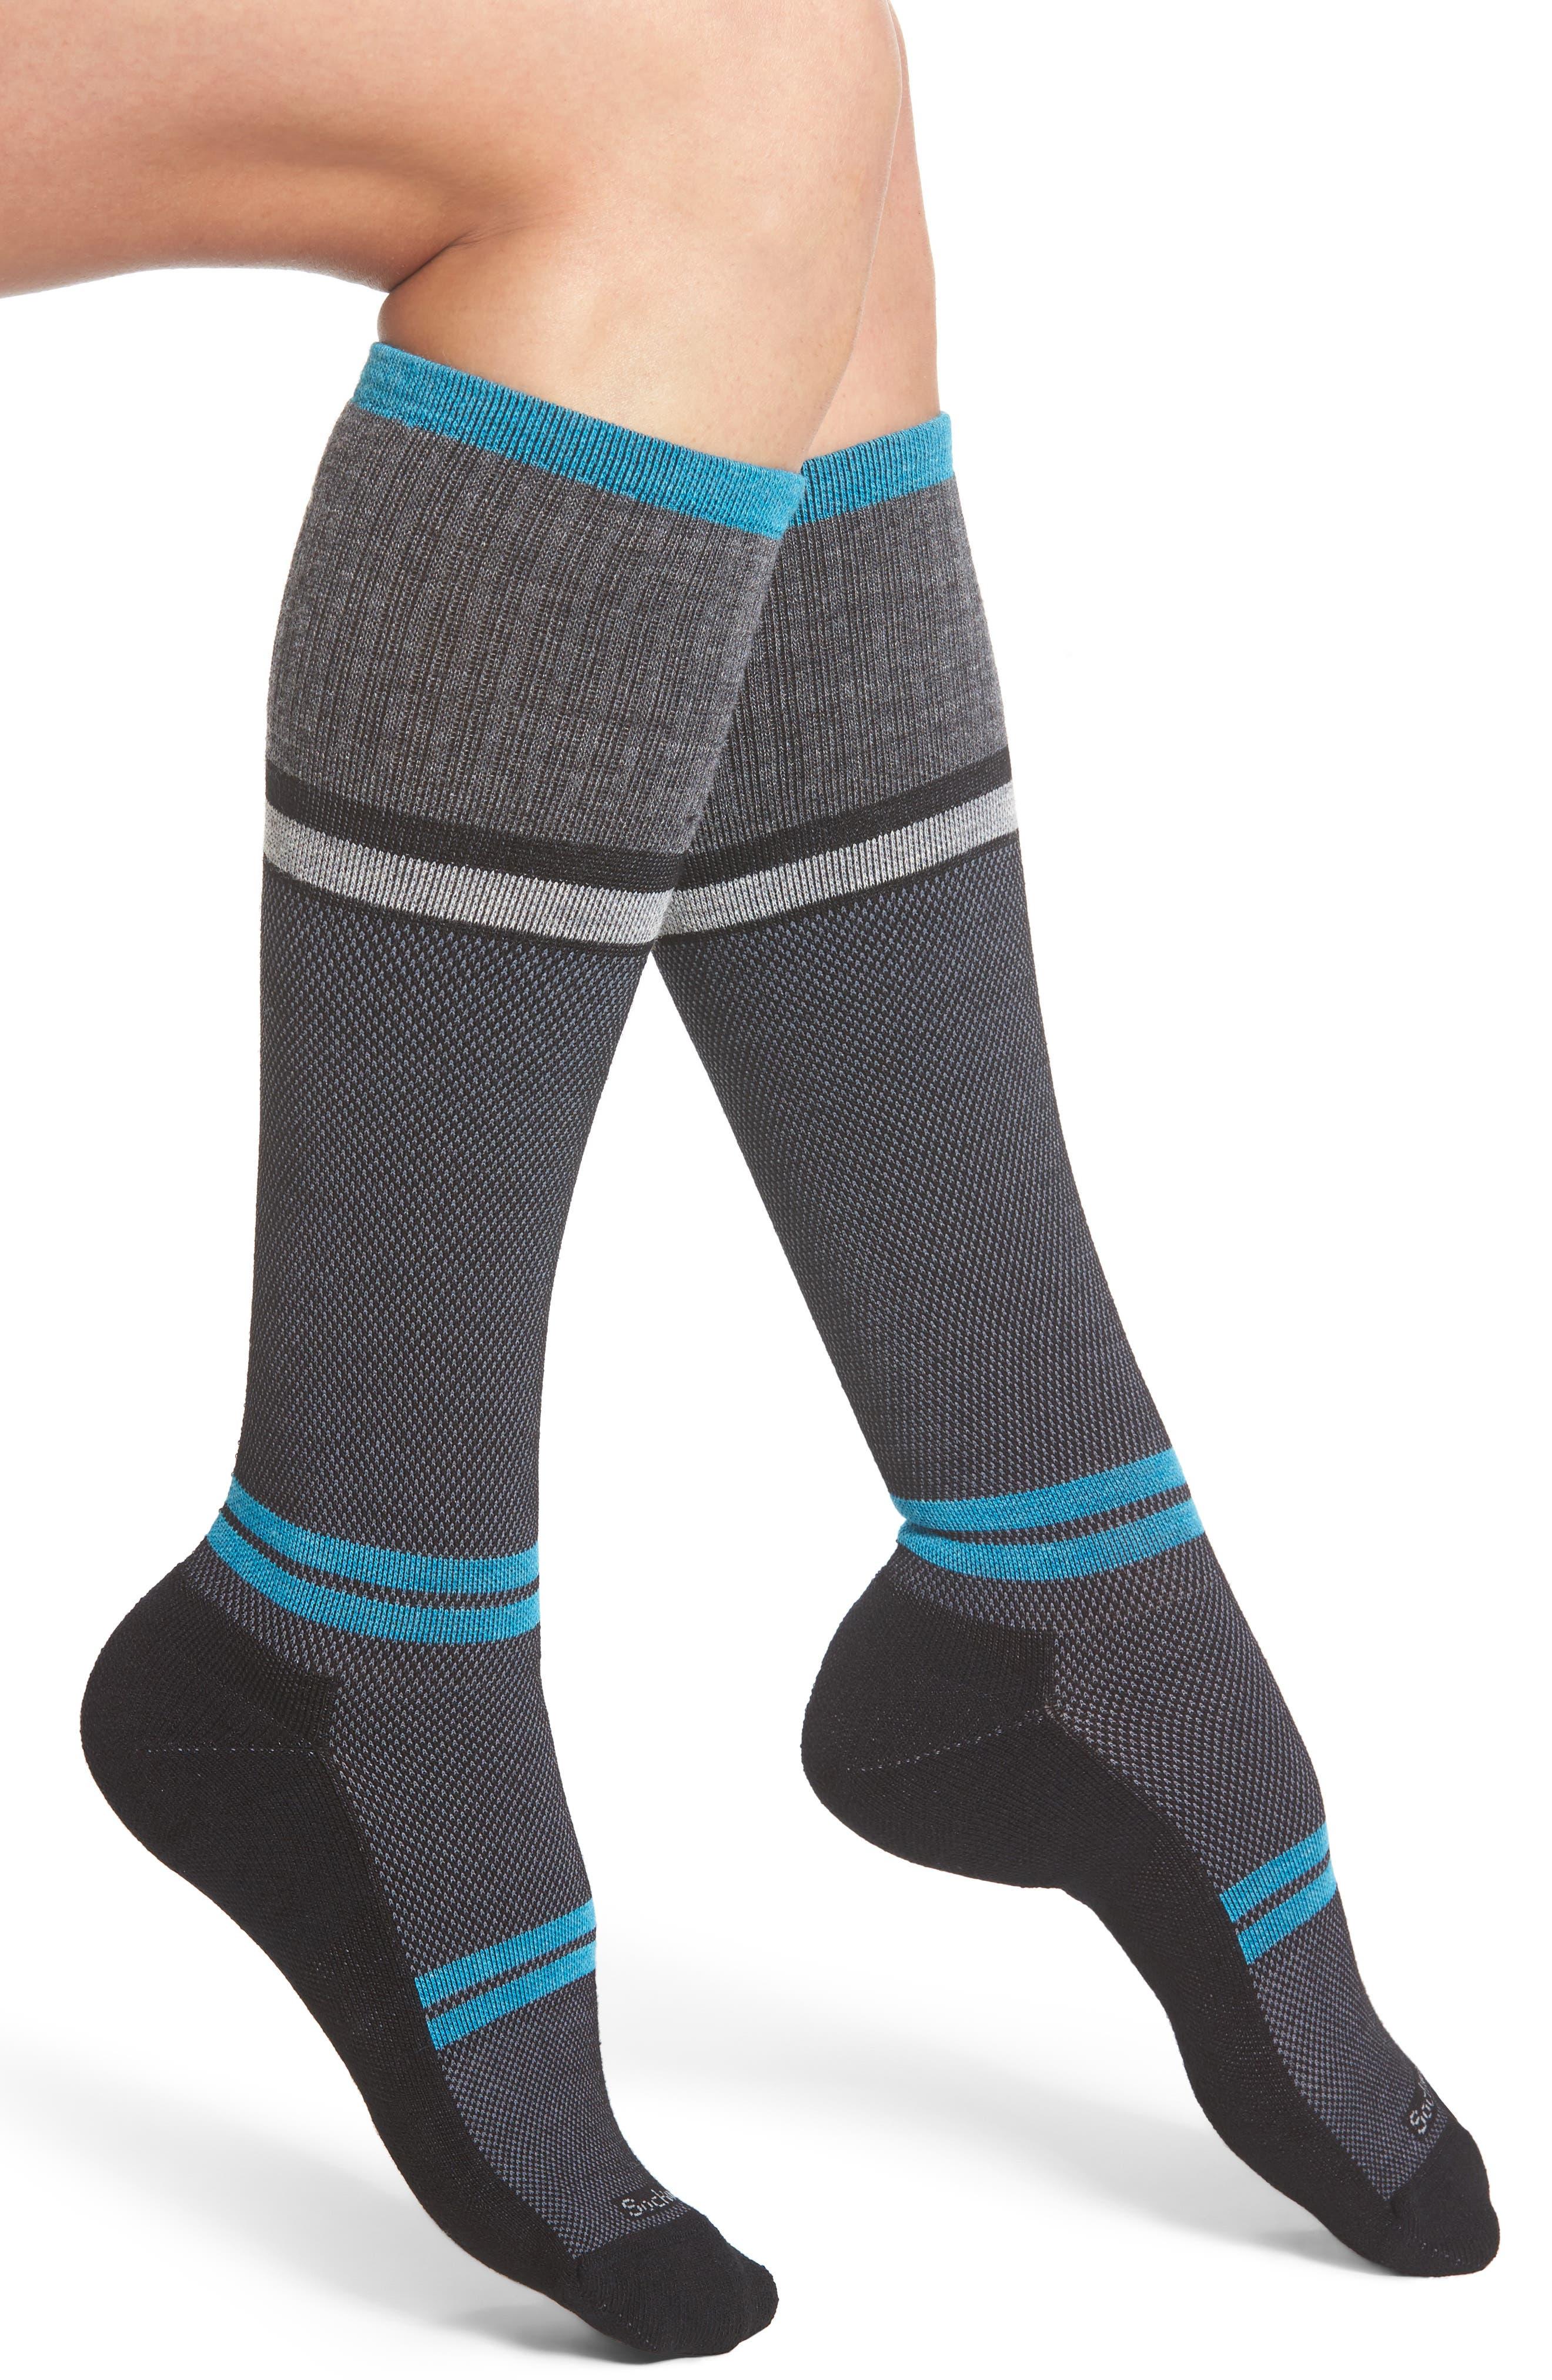 'Sport Flirt' Compression Knee Socks,                             Main thumbnail 1, color,                             001